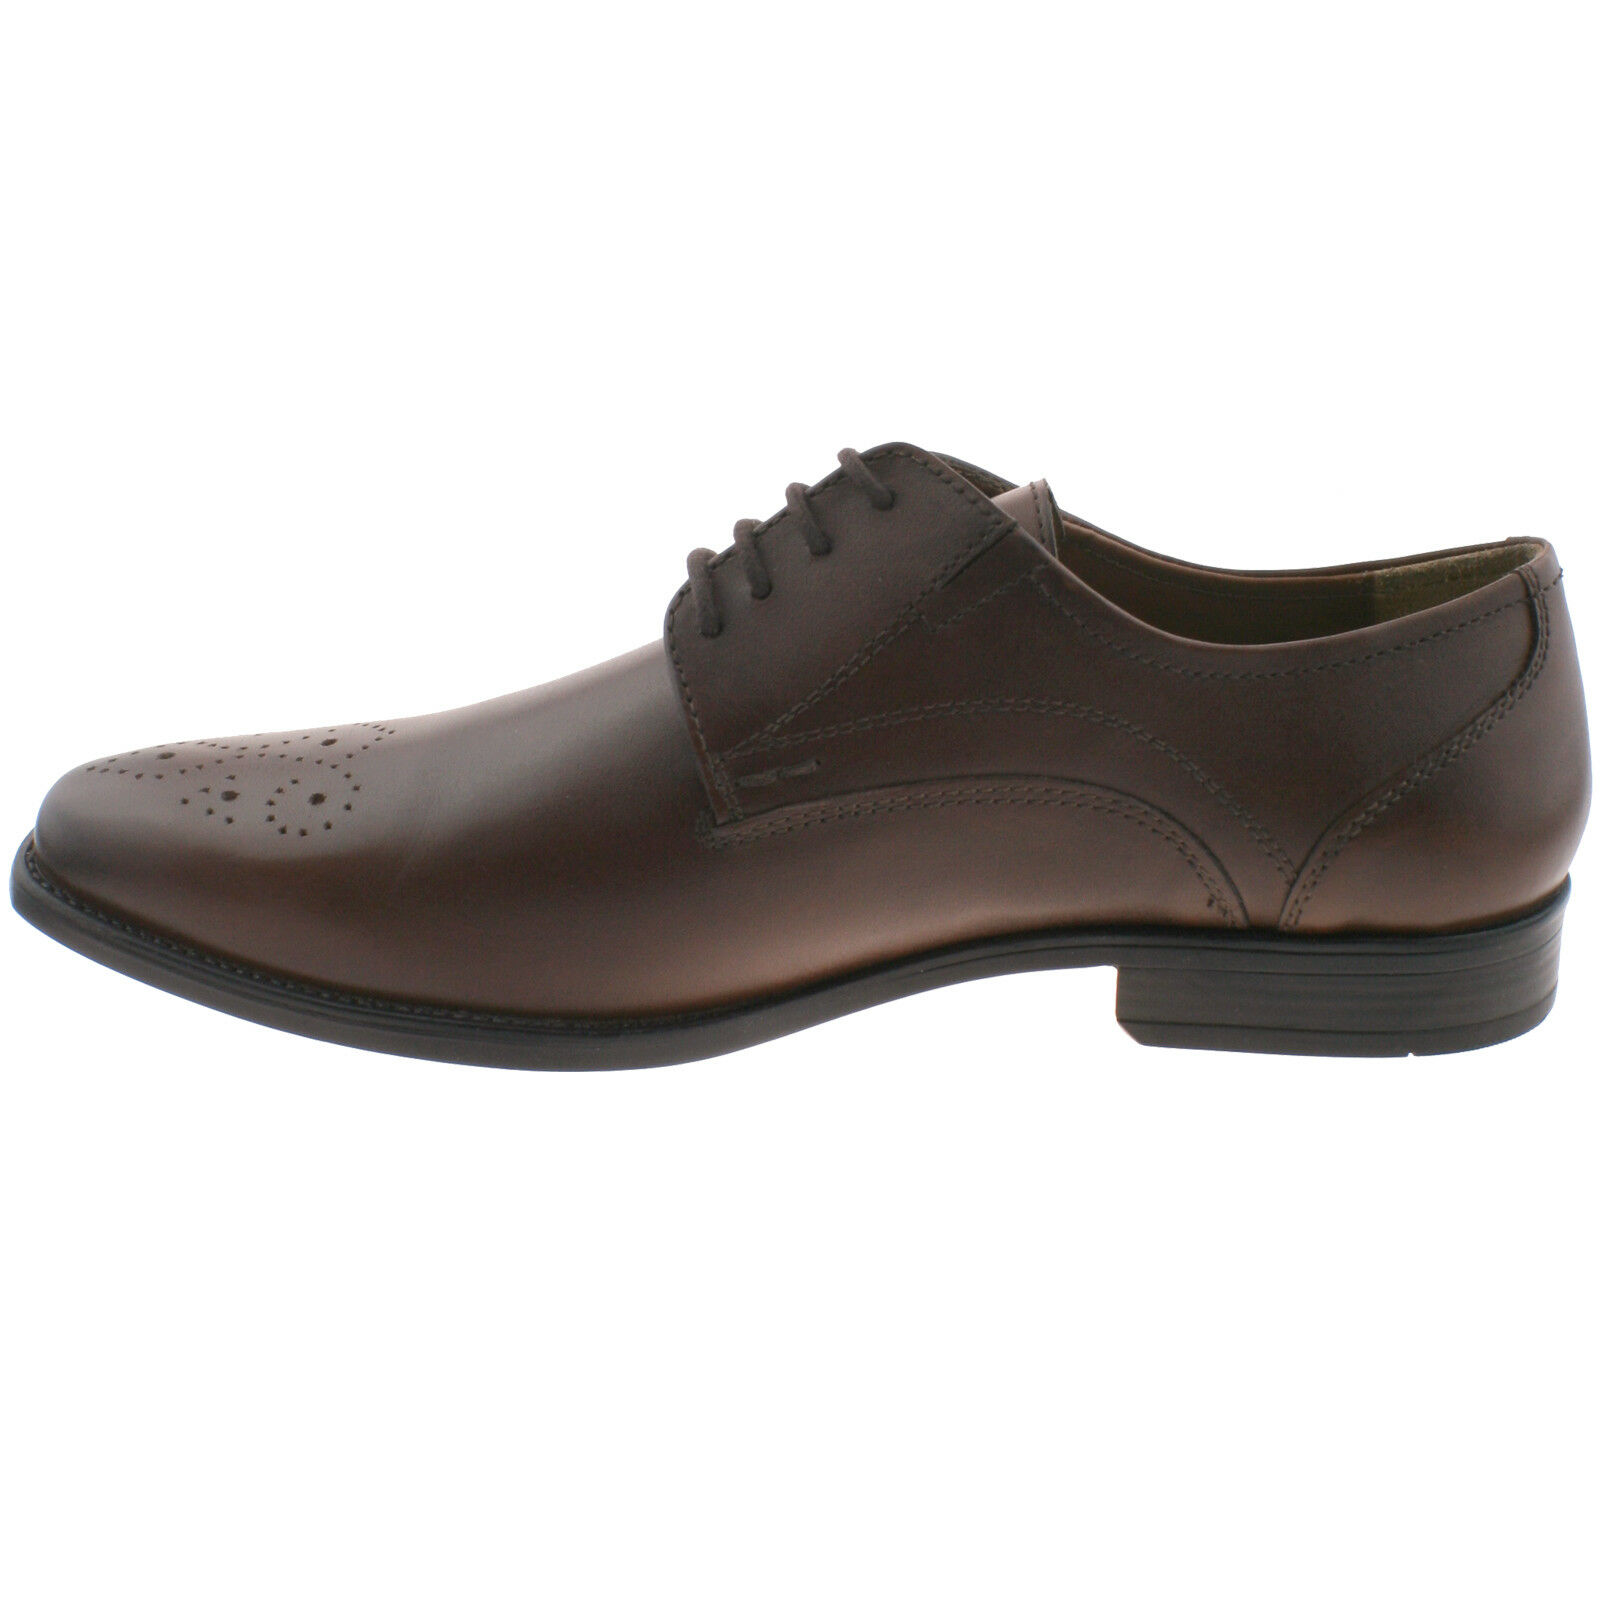 Da Uomo LOT  rifiniture marroni in in pelle stringati in in Memory Foam ufficio SMART Shoes 1b4faa